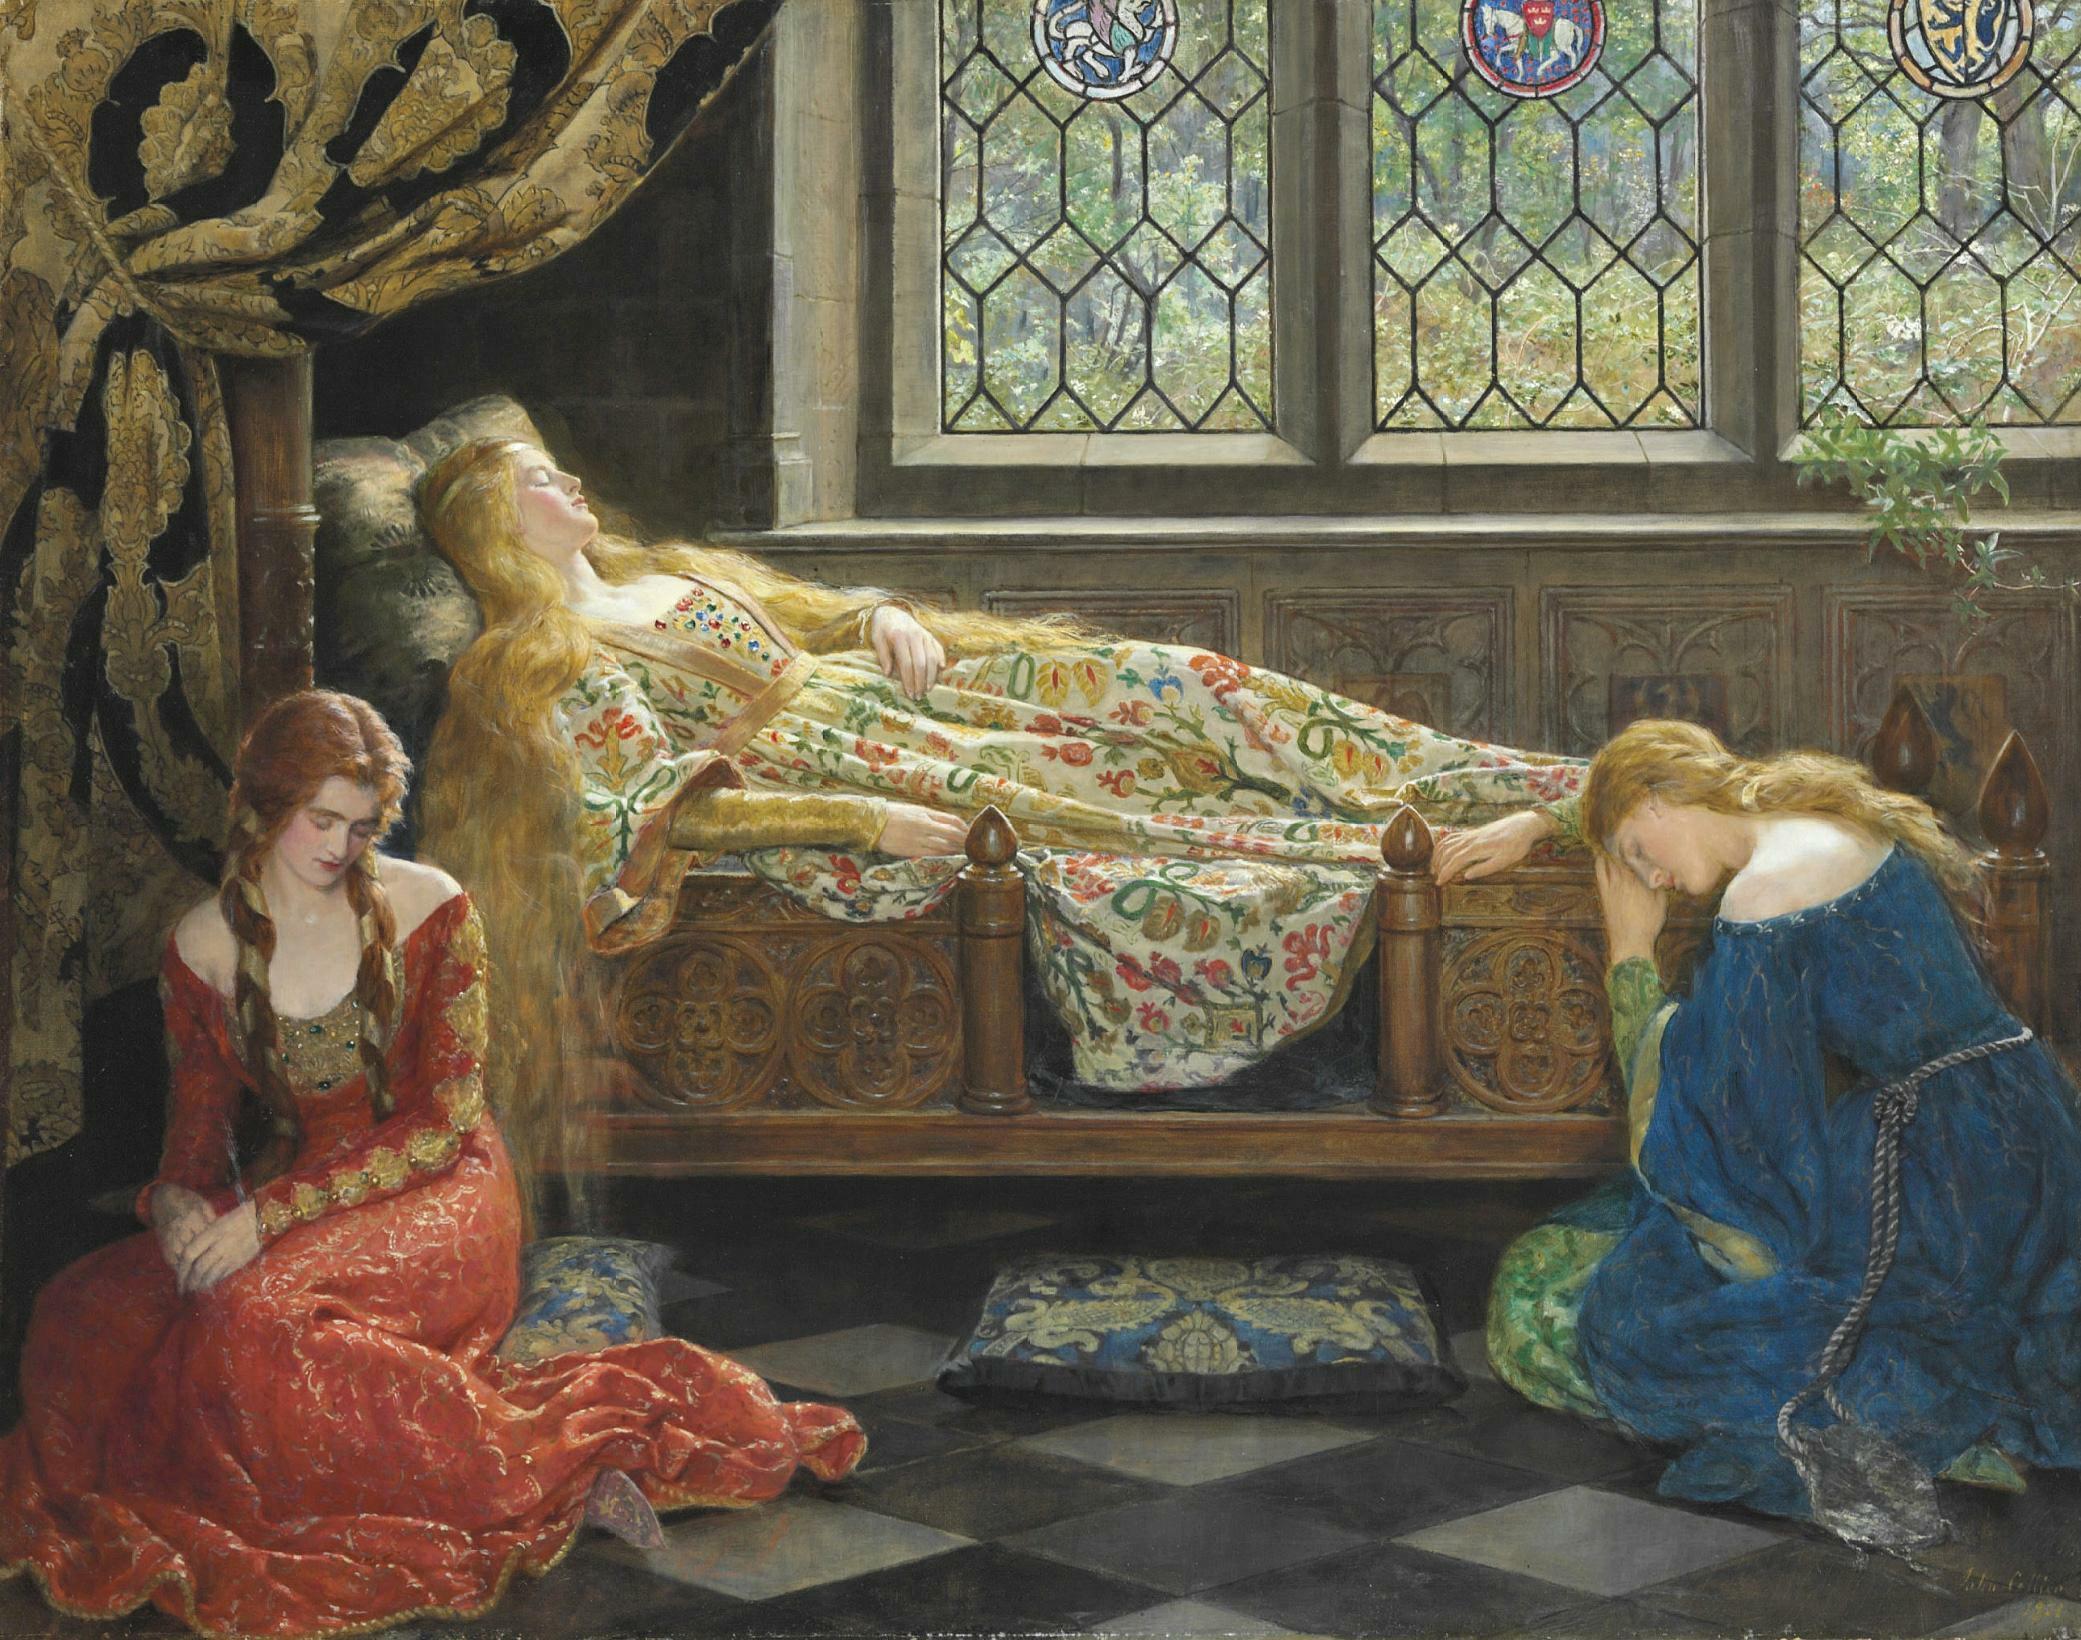 John collier sleeping beauty